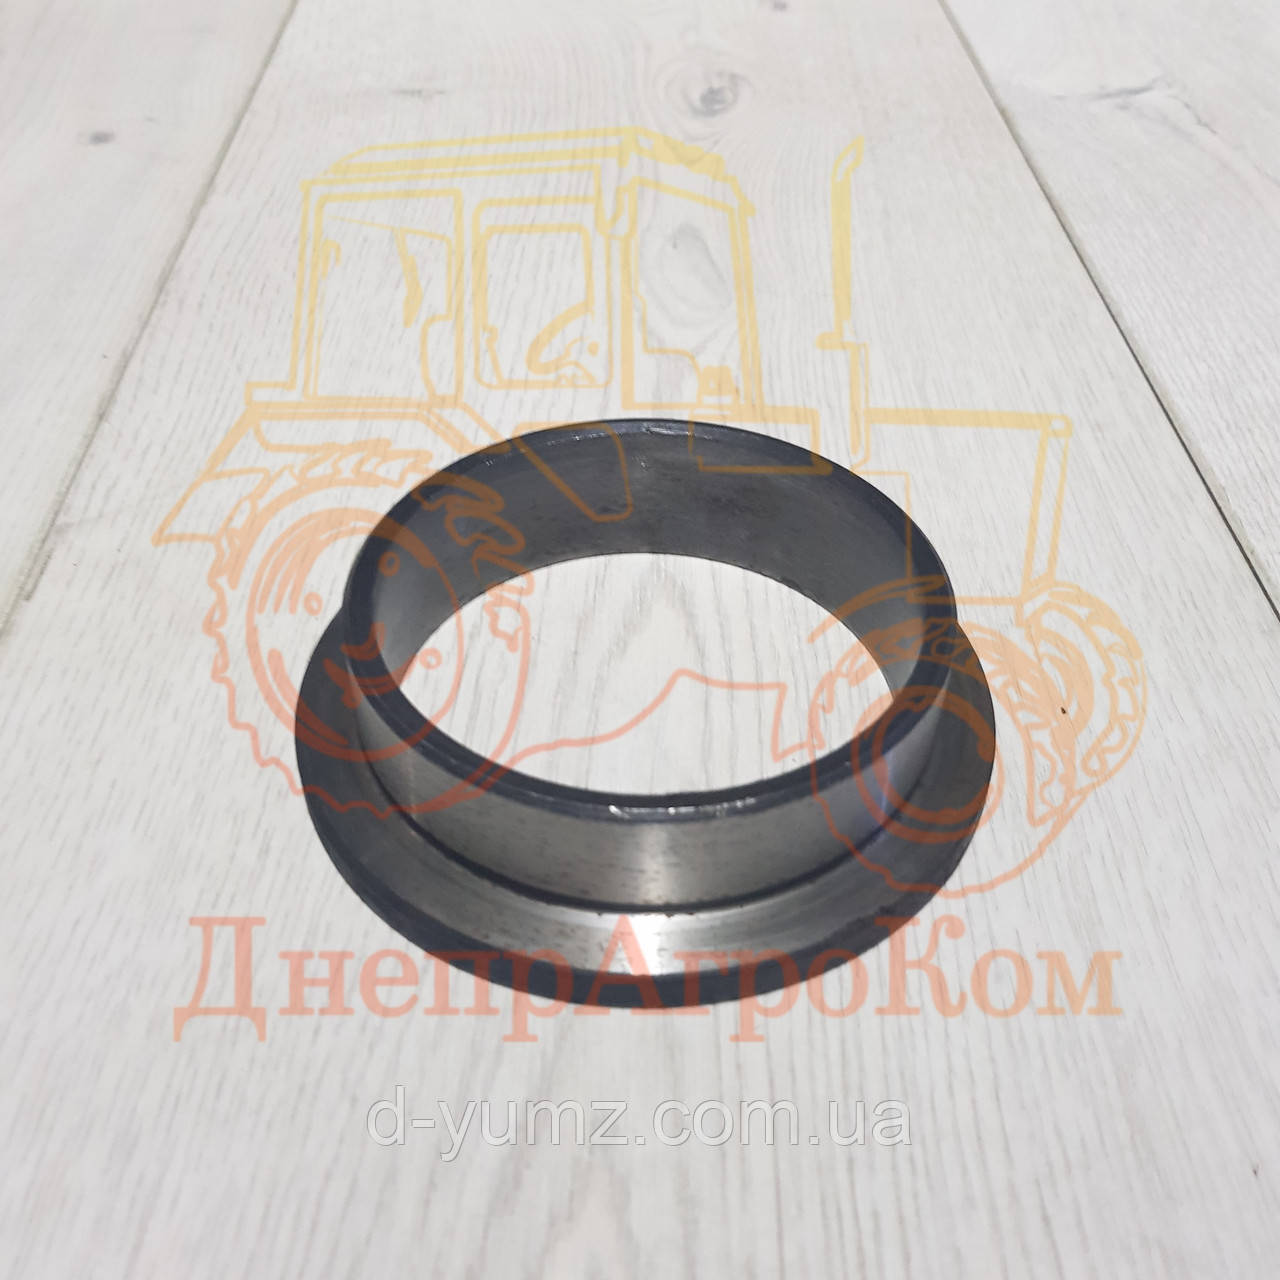 Кольцо упорное подшипника (кольцо отводки) ЮМЗ